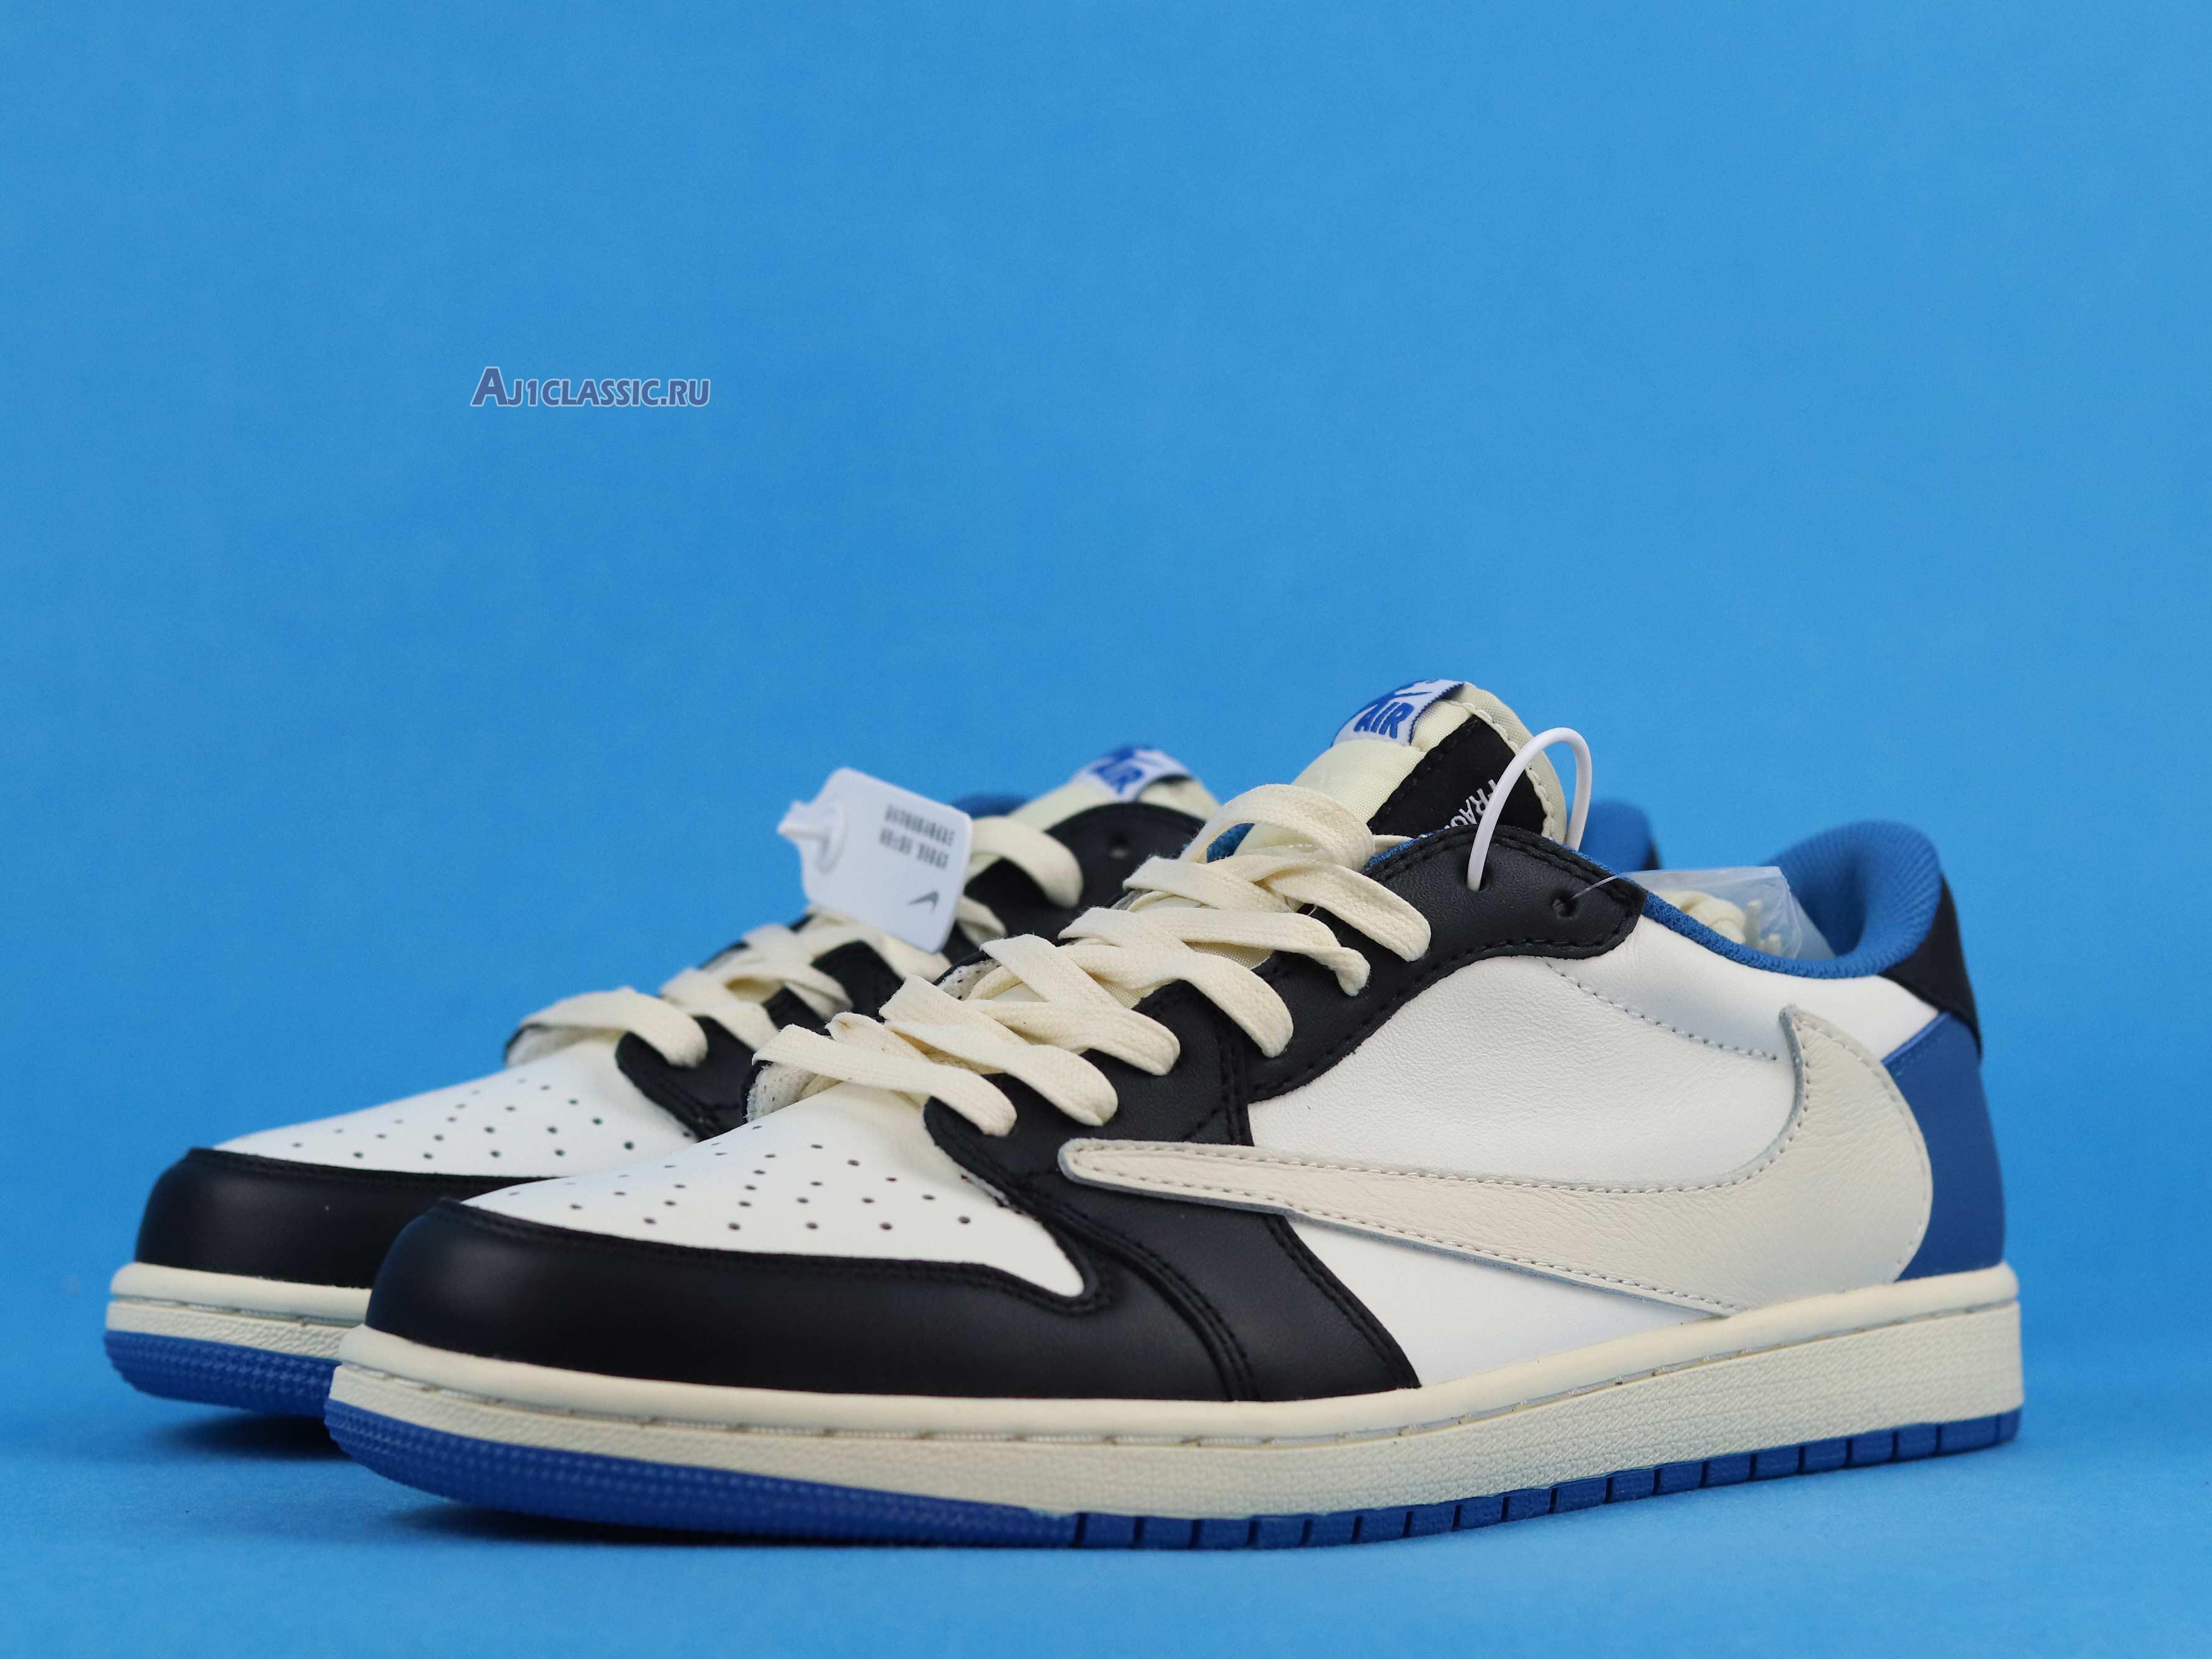 "Travis Scott x fragment x Air Jordan 1 Low OG ""Military Blue"" CQ3227-105"